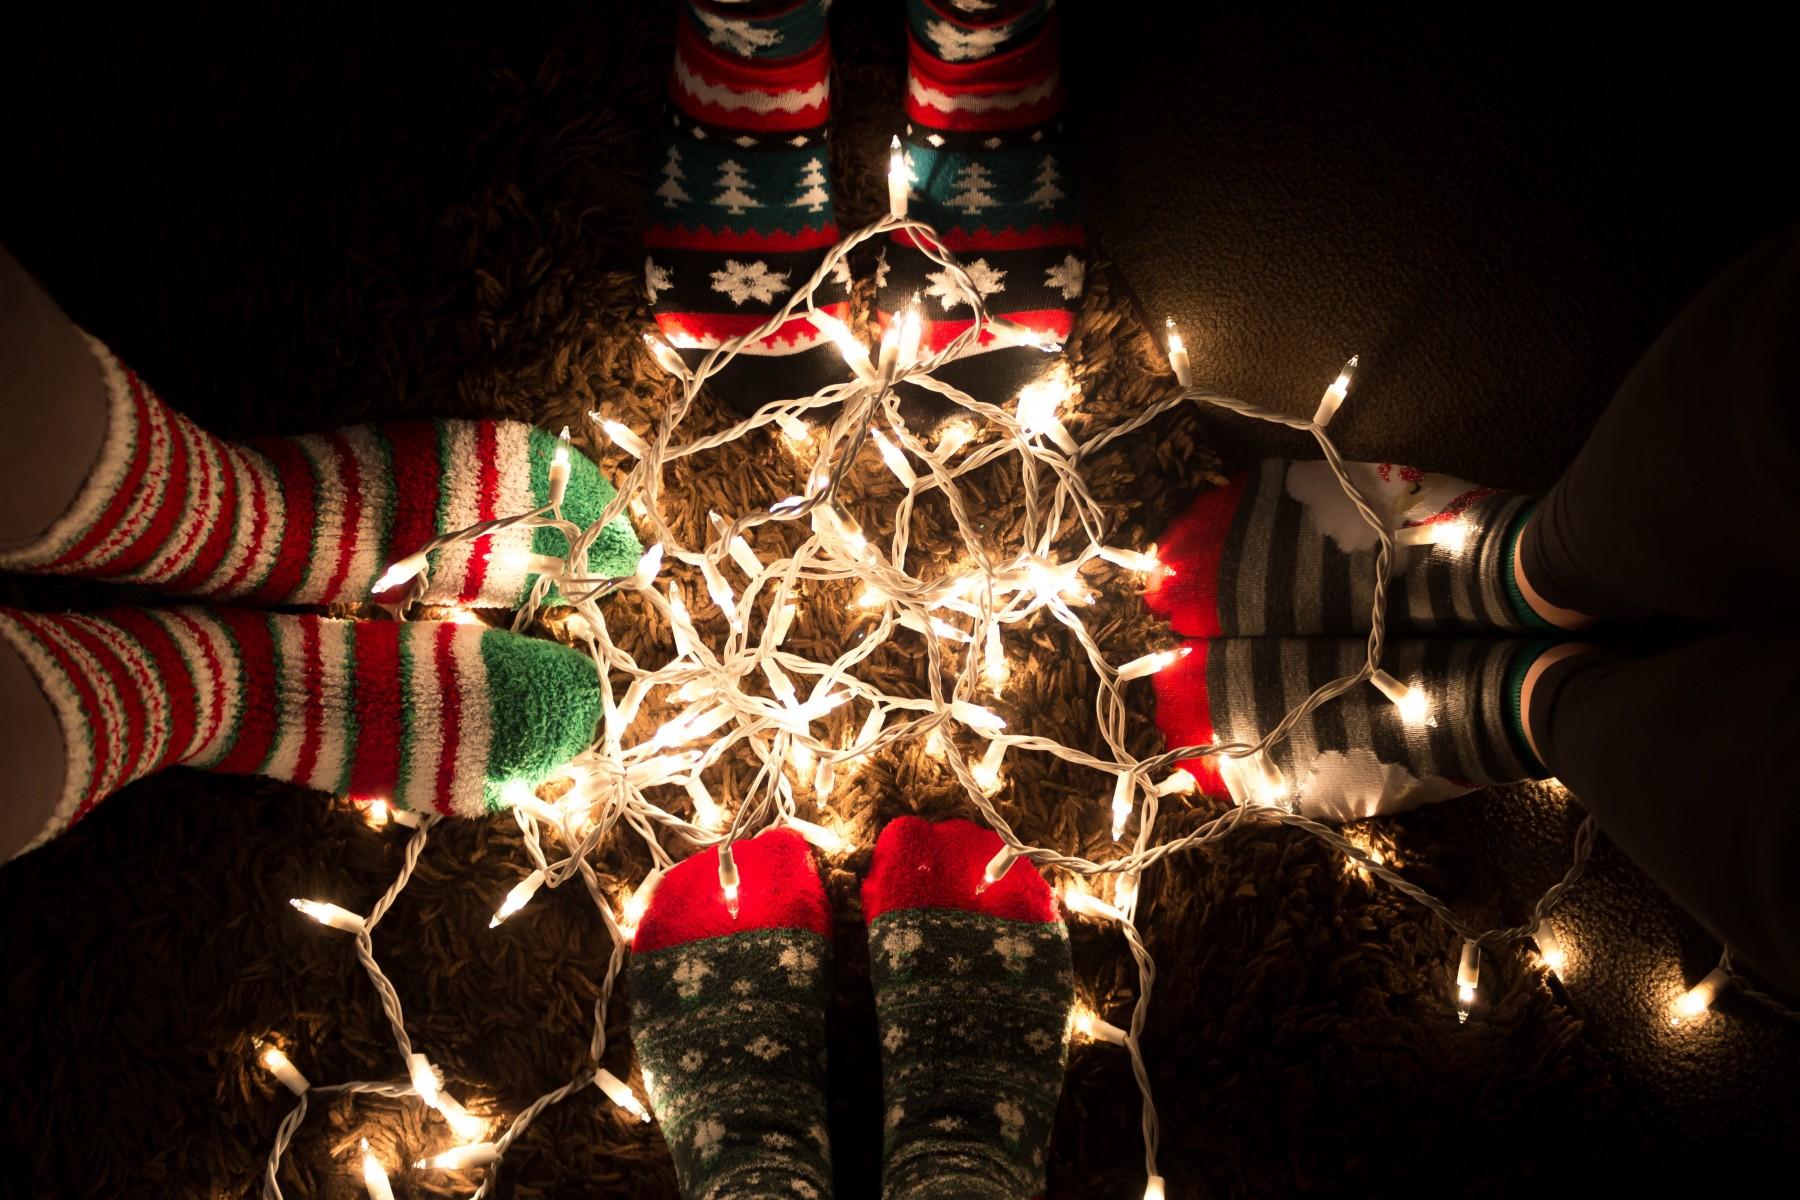 holiday lighting - Tim Kyle